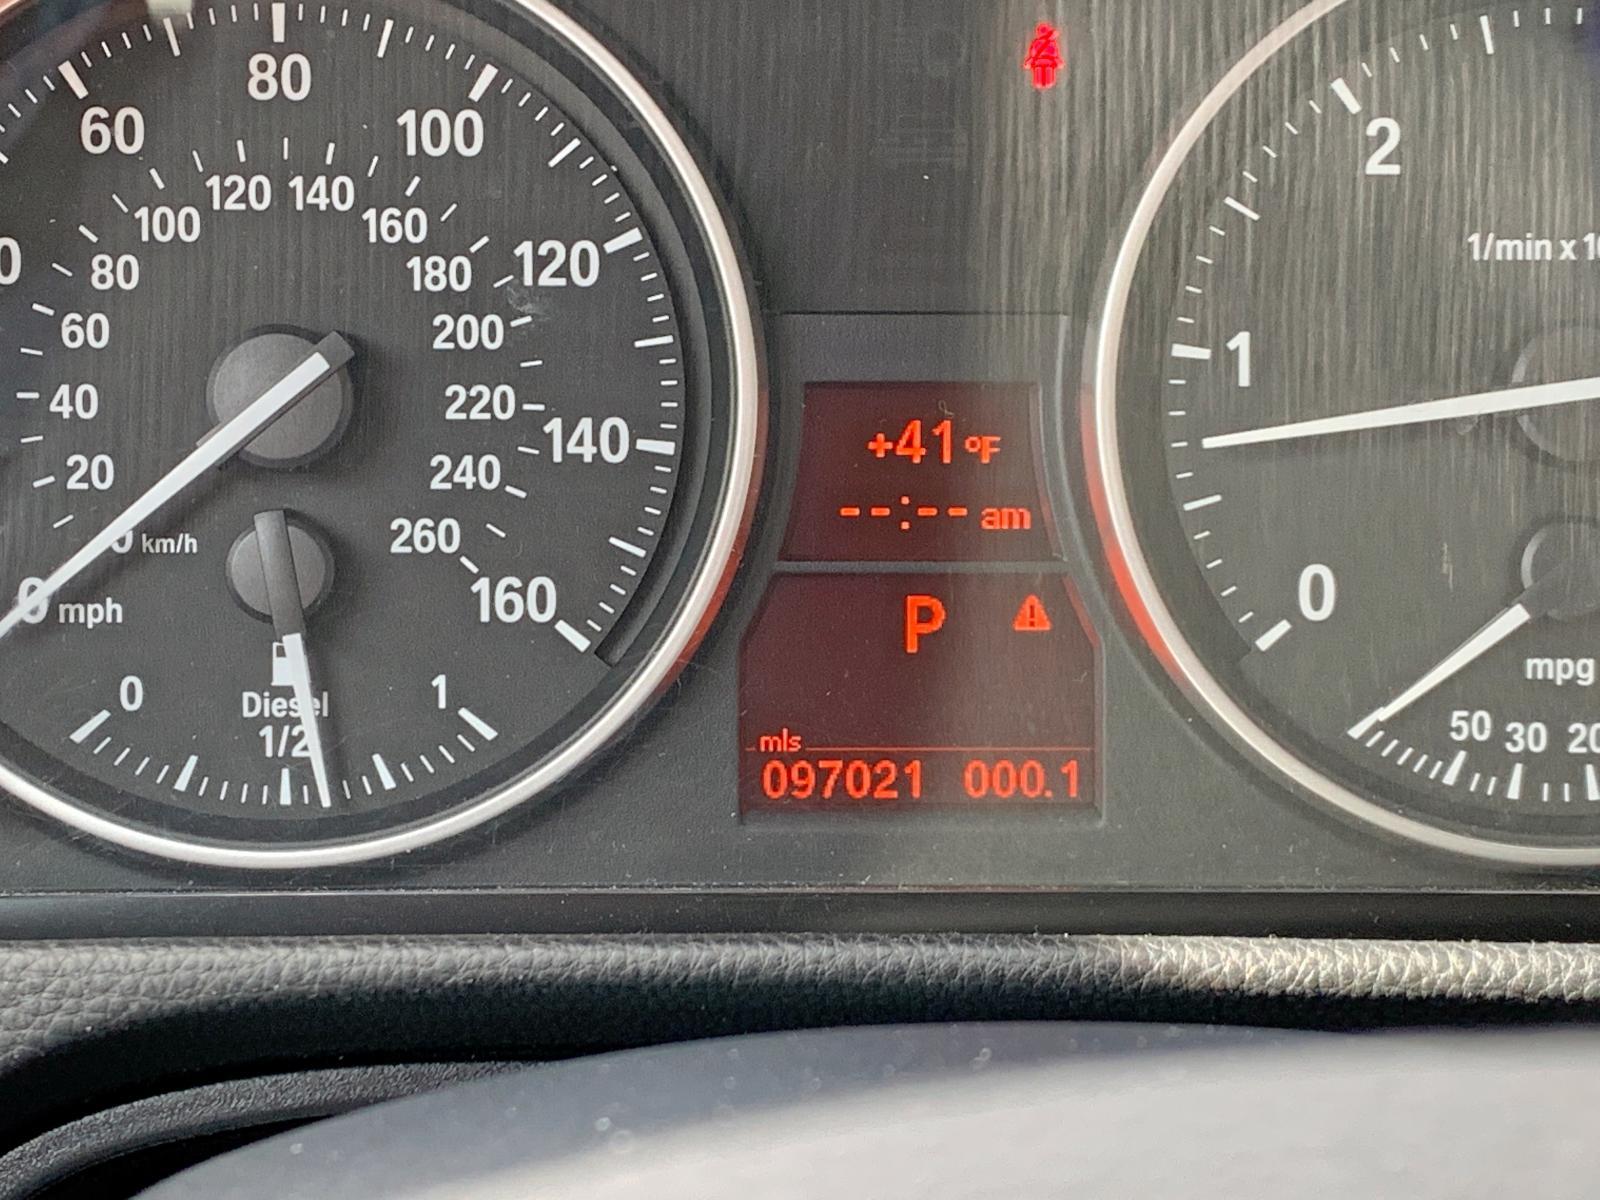 WBAPN7C57BA780363 - 2011 Bmw 335 D 3.0L engine view